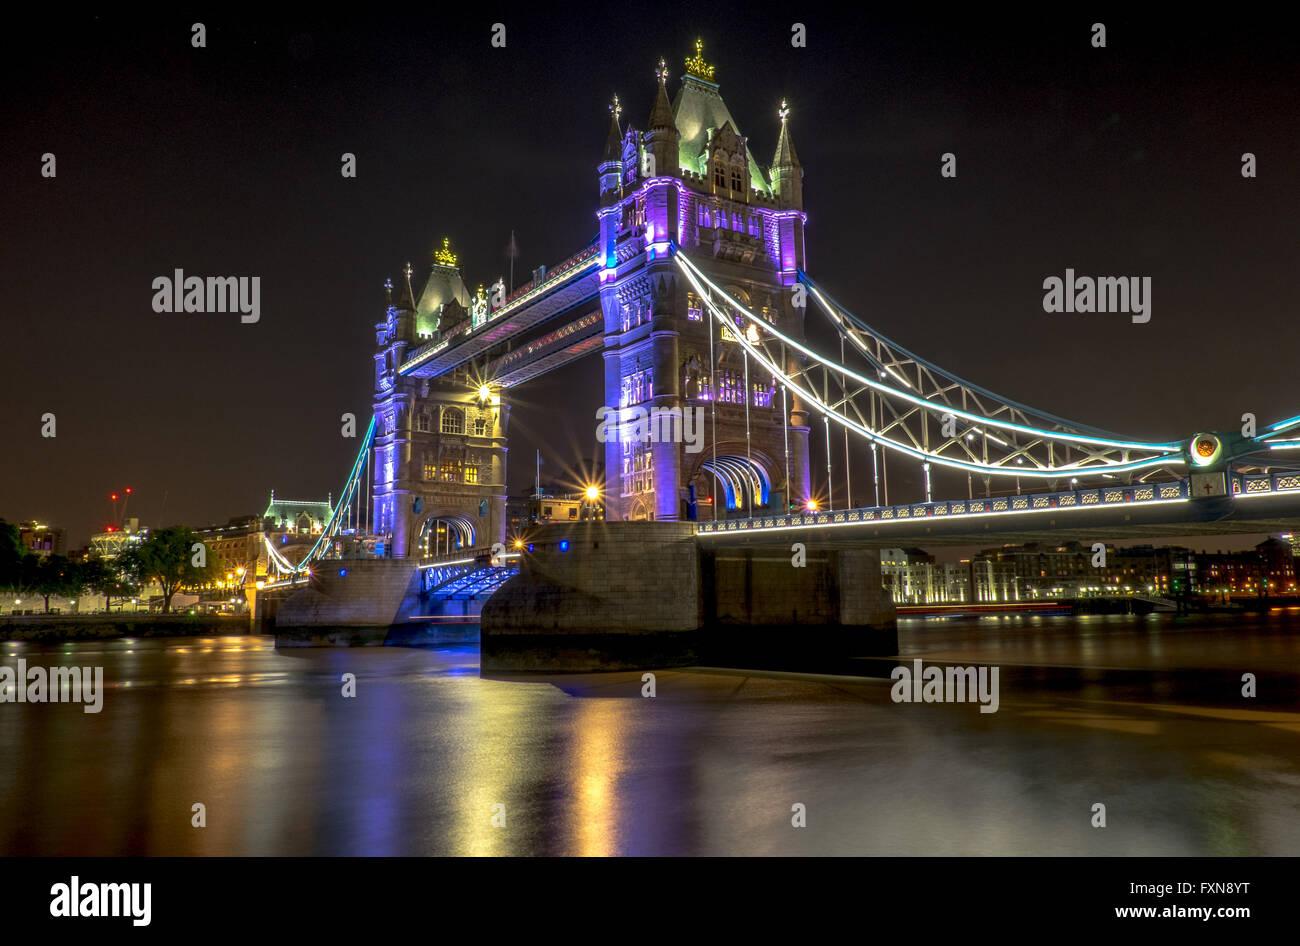 Night time image of London Tower Bridge - Stock Image